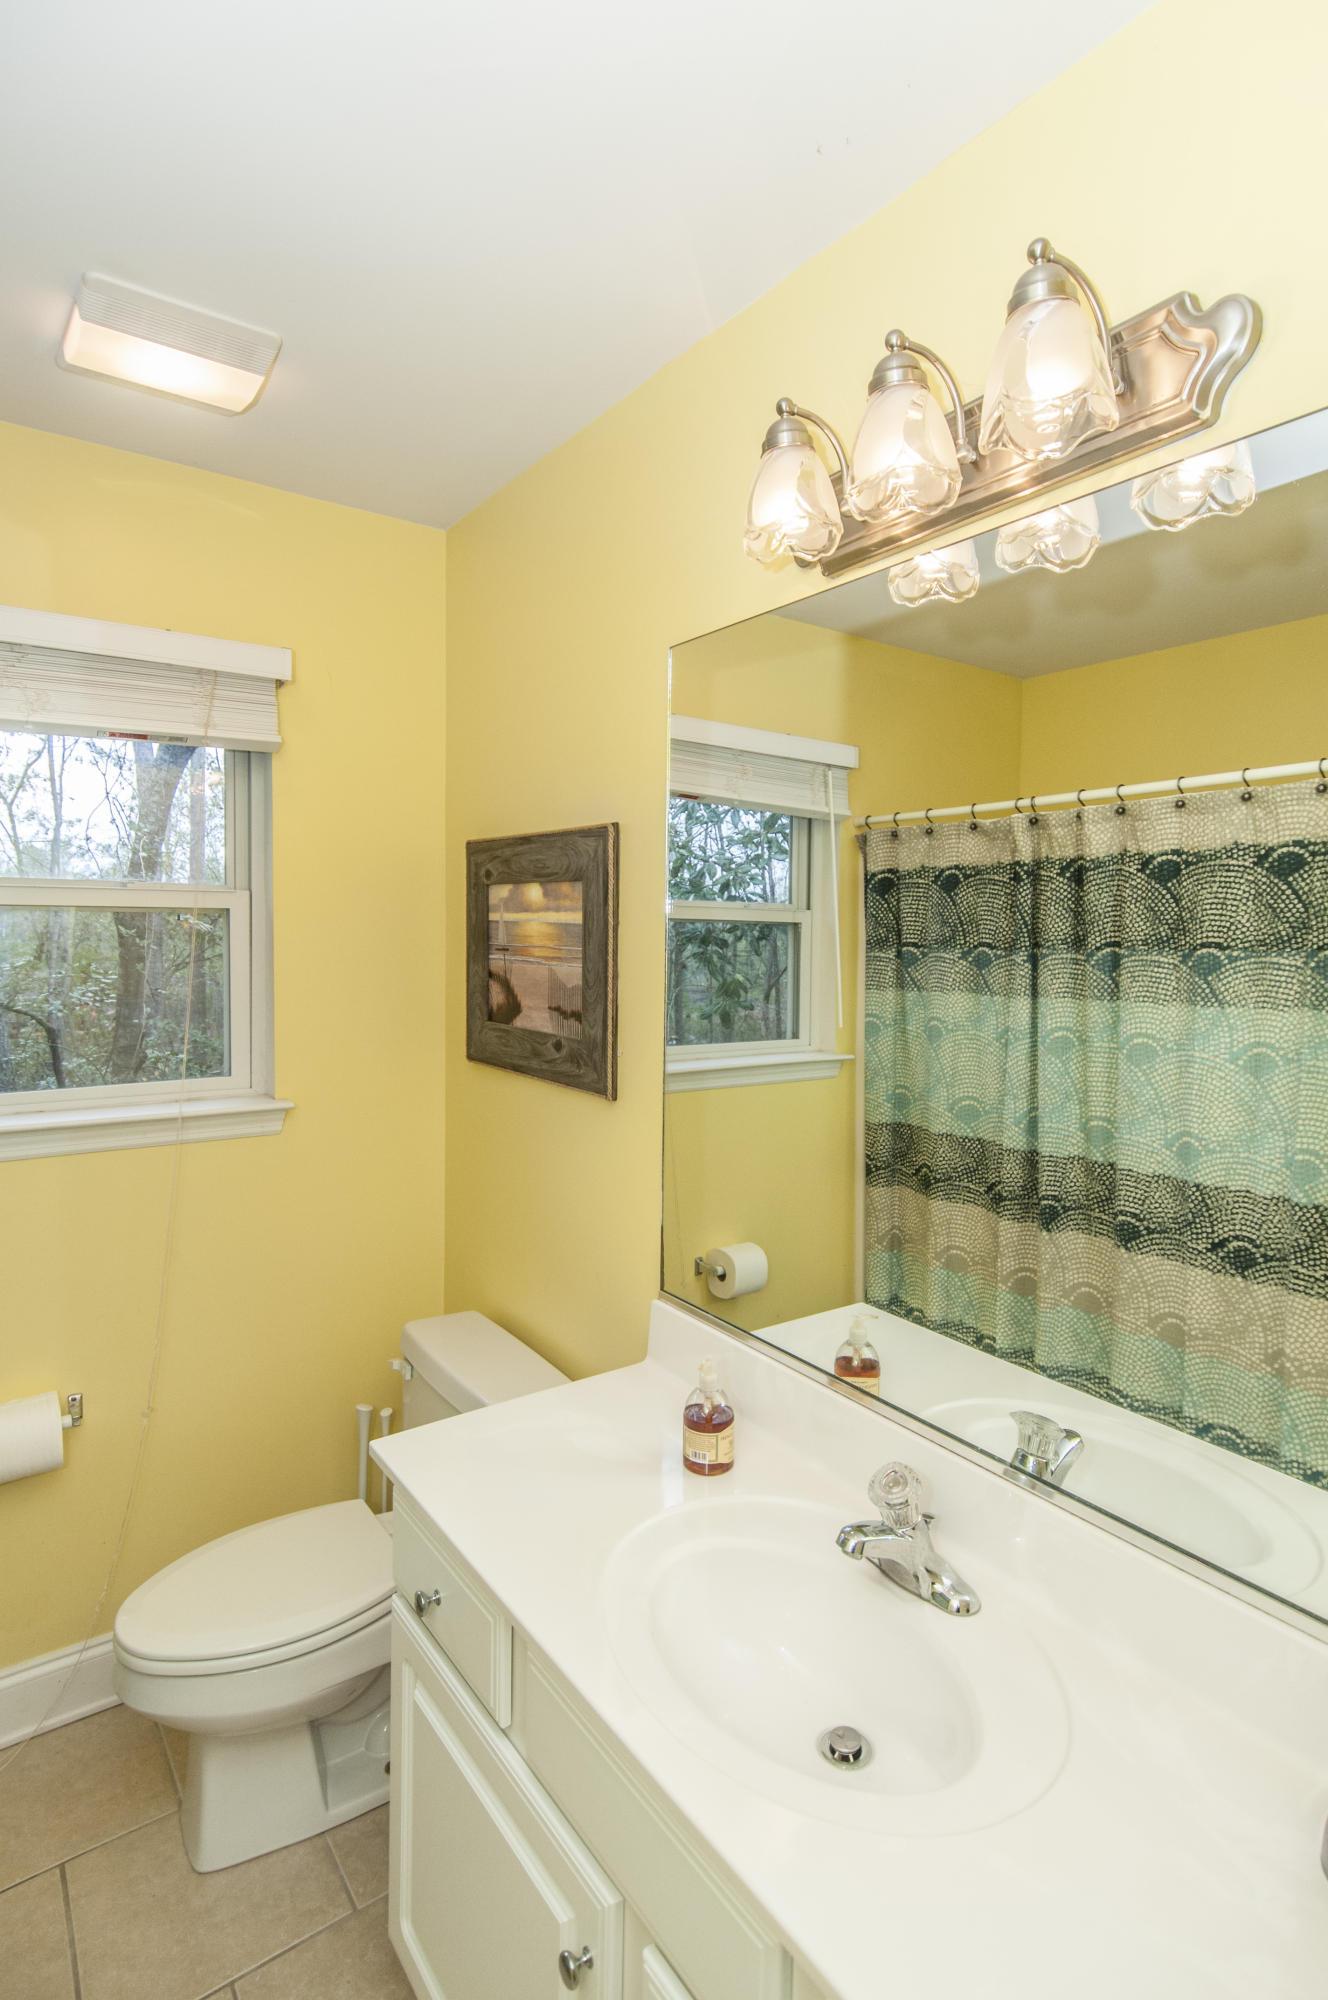 Longbranch Point Homes For Sale - 940 Estates, Charleston, SC - 11